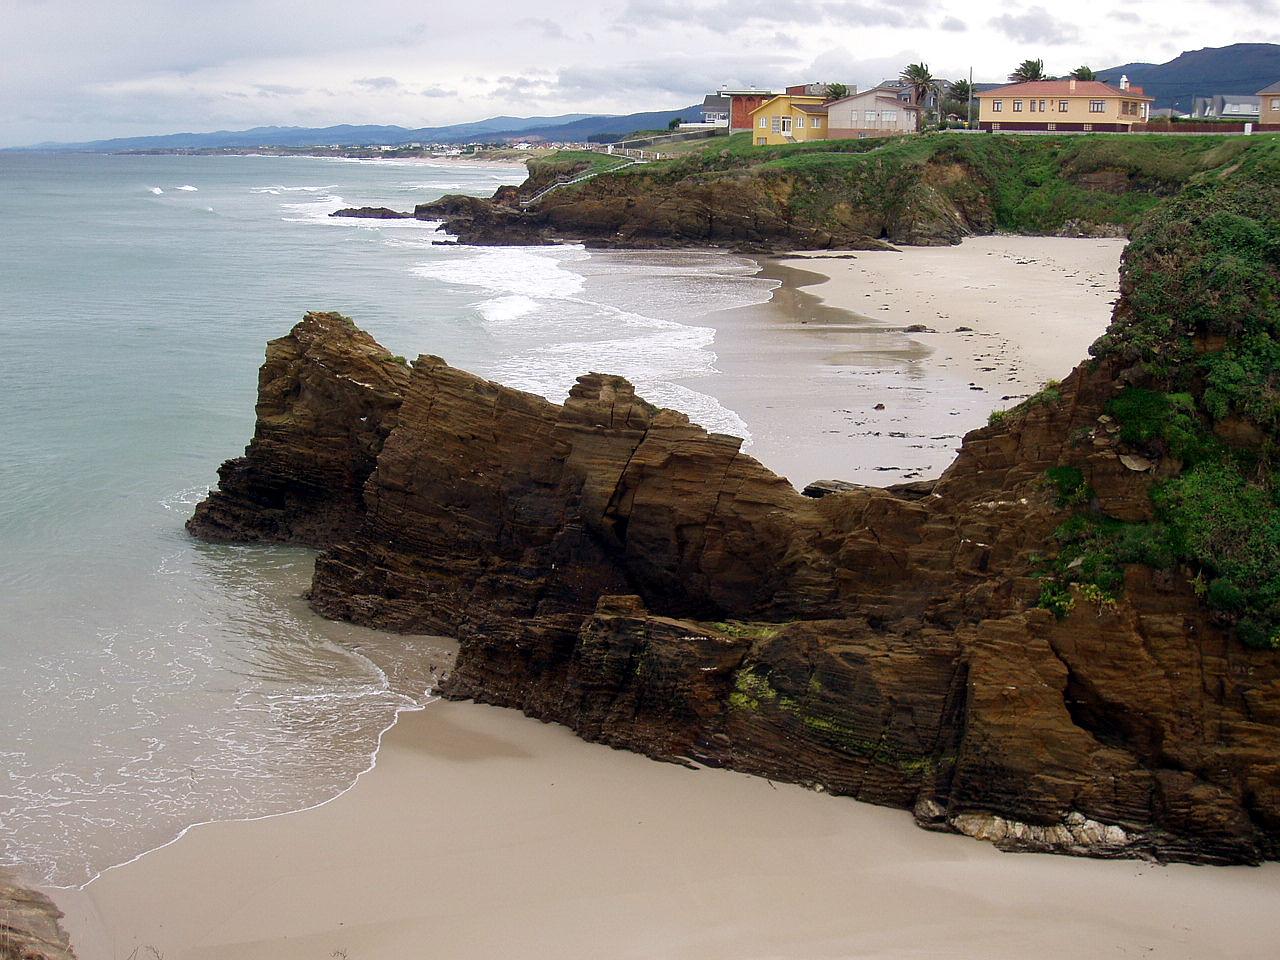 Foto playa San Cosme / Altar. Playas de San Bartolo, San Cosme de Barrerios, Lugo, España